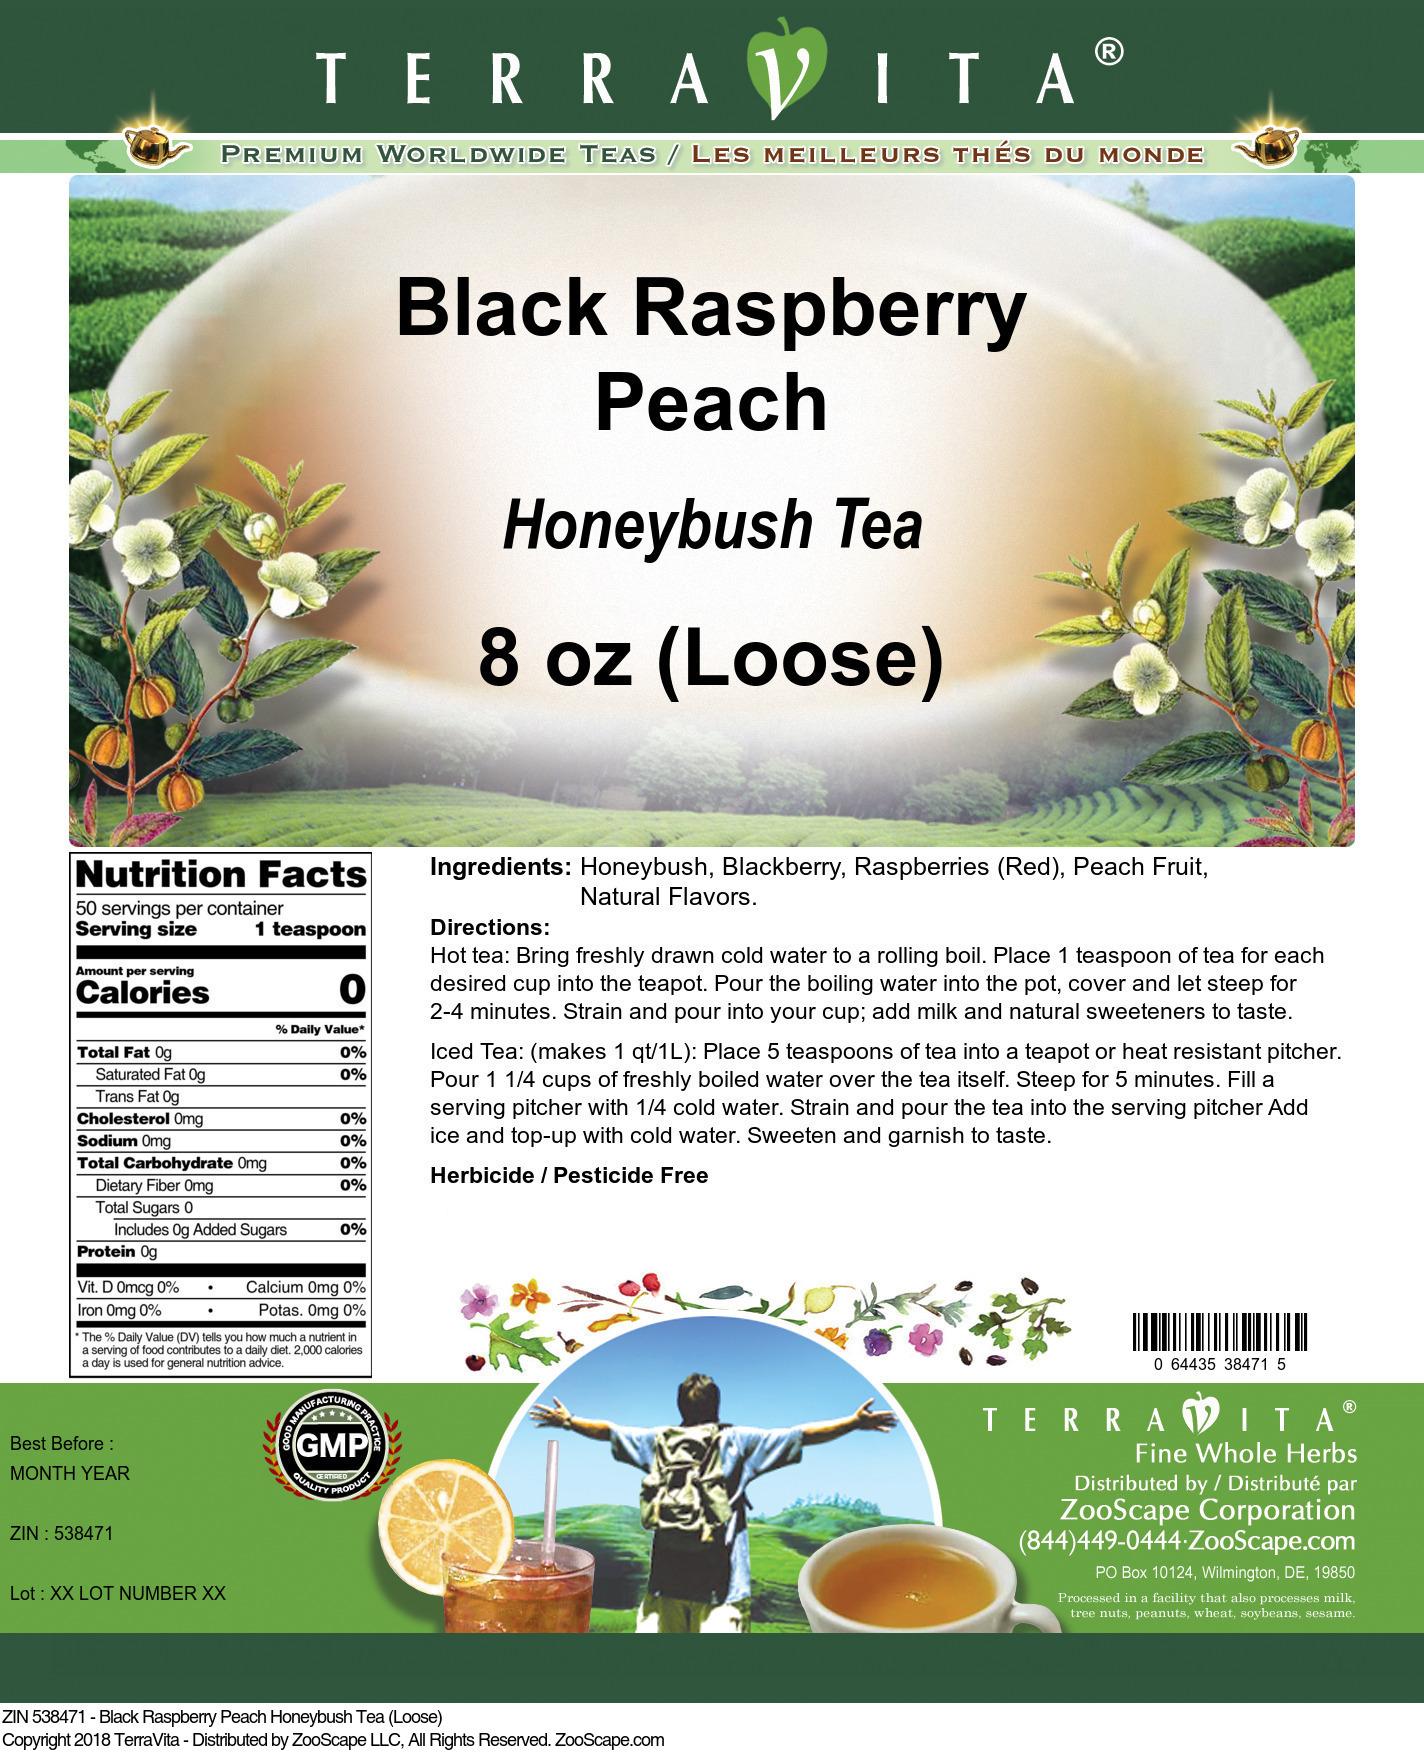 Black Raspberry Peach Honeybush Tea (Loose)